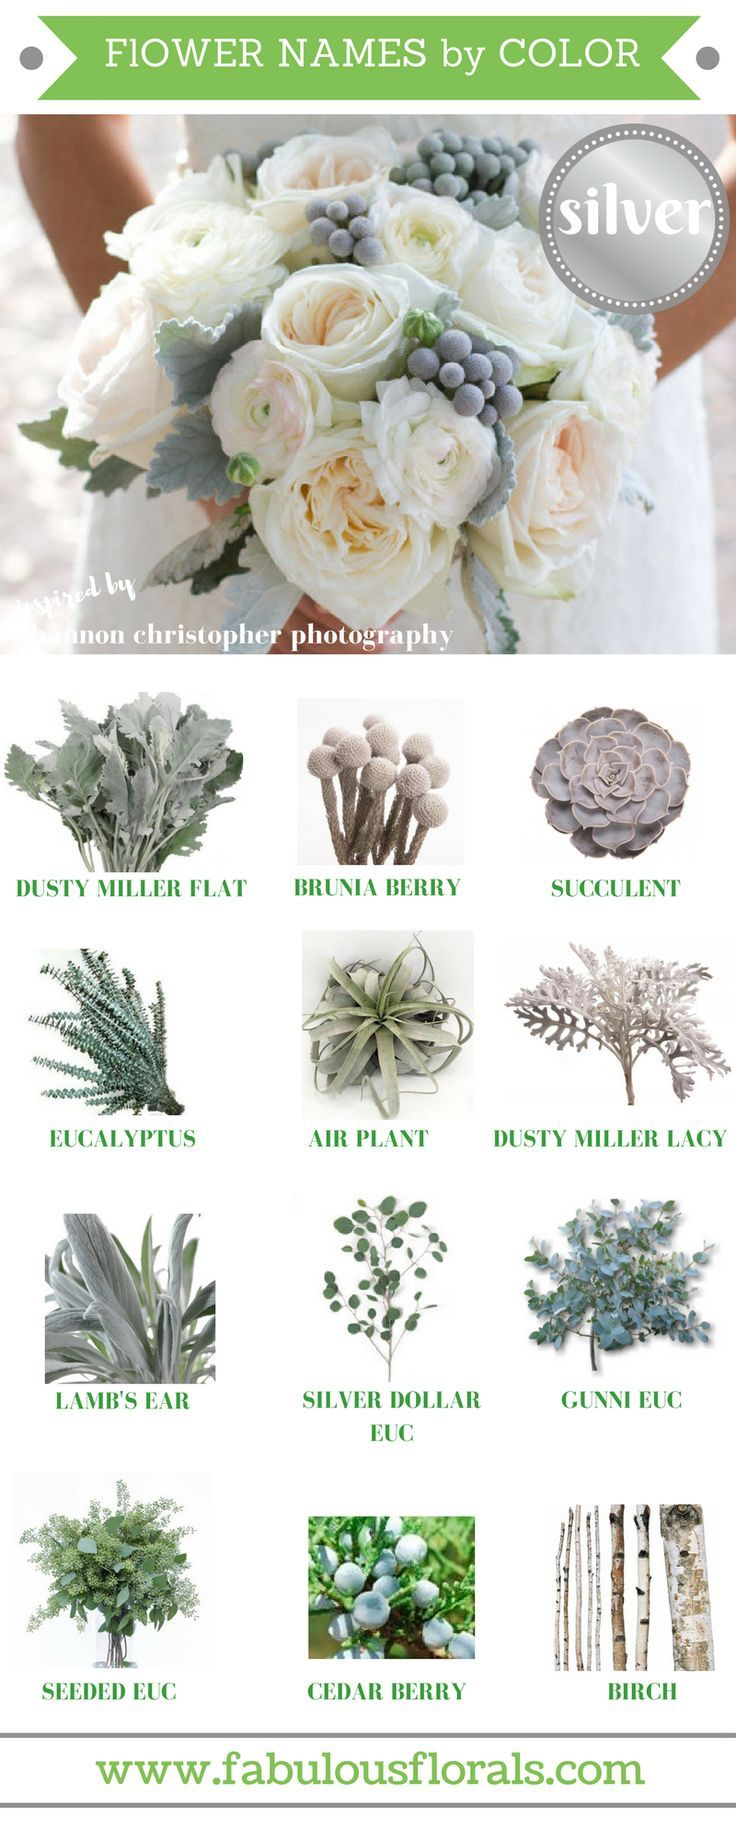 Natural silver grey flower accents wedding flower ideas non natural silver grey flower accents wedding flower ideas non traditional wedding flowers izmirmasajfo